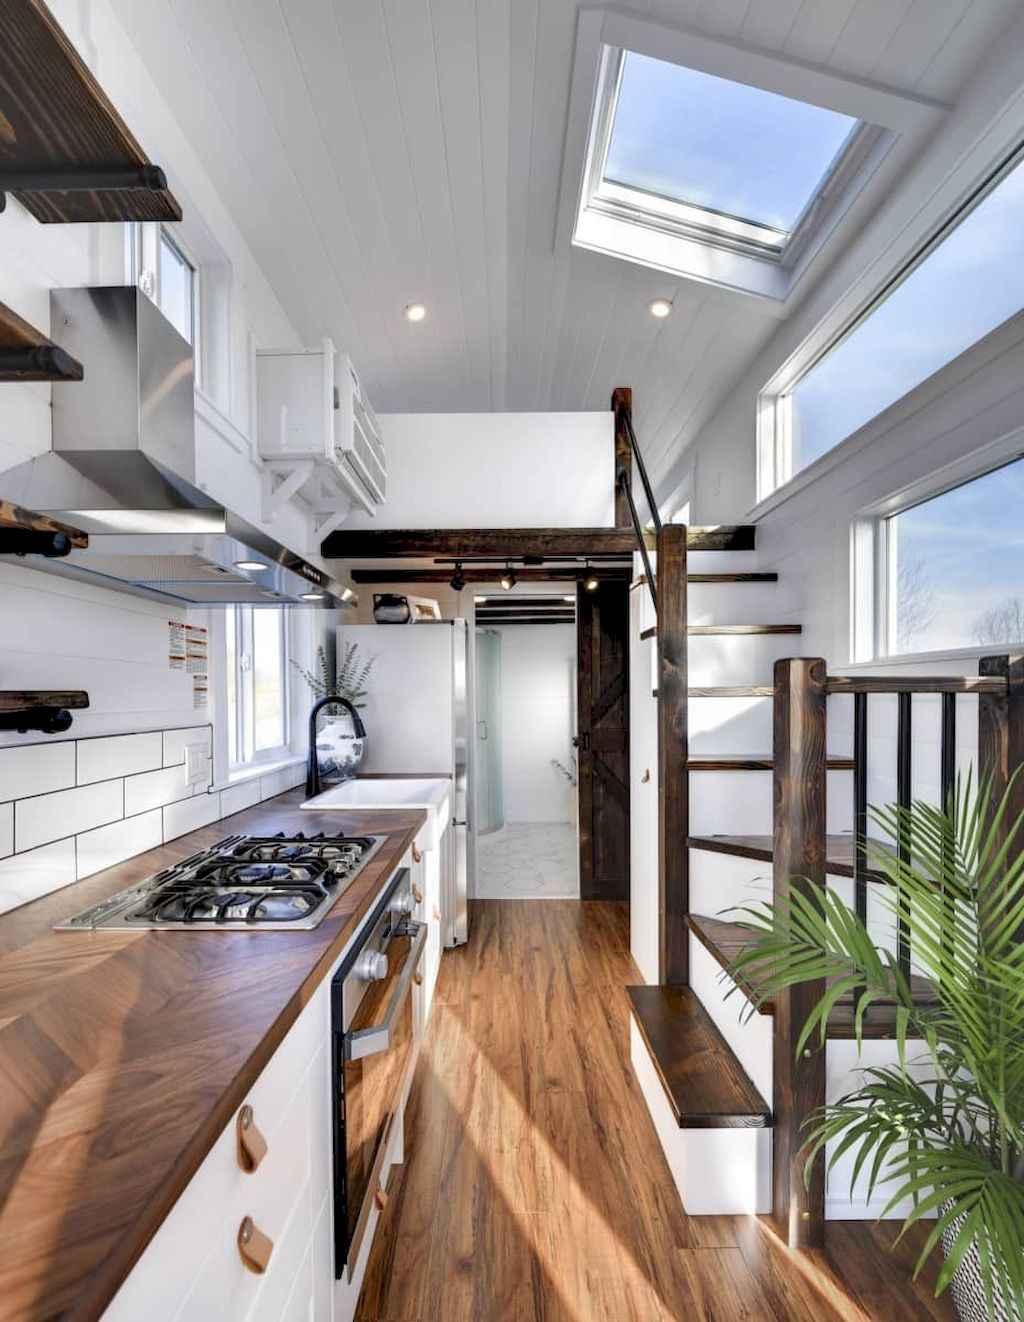 53 Tiny House Kitchen Storage Organization and Tips Ideas